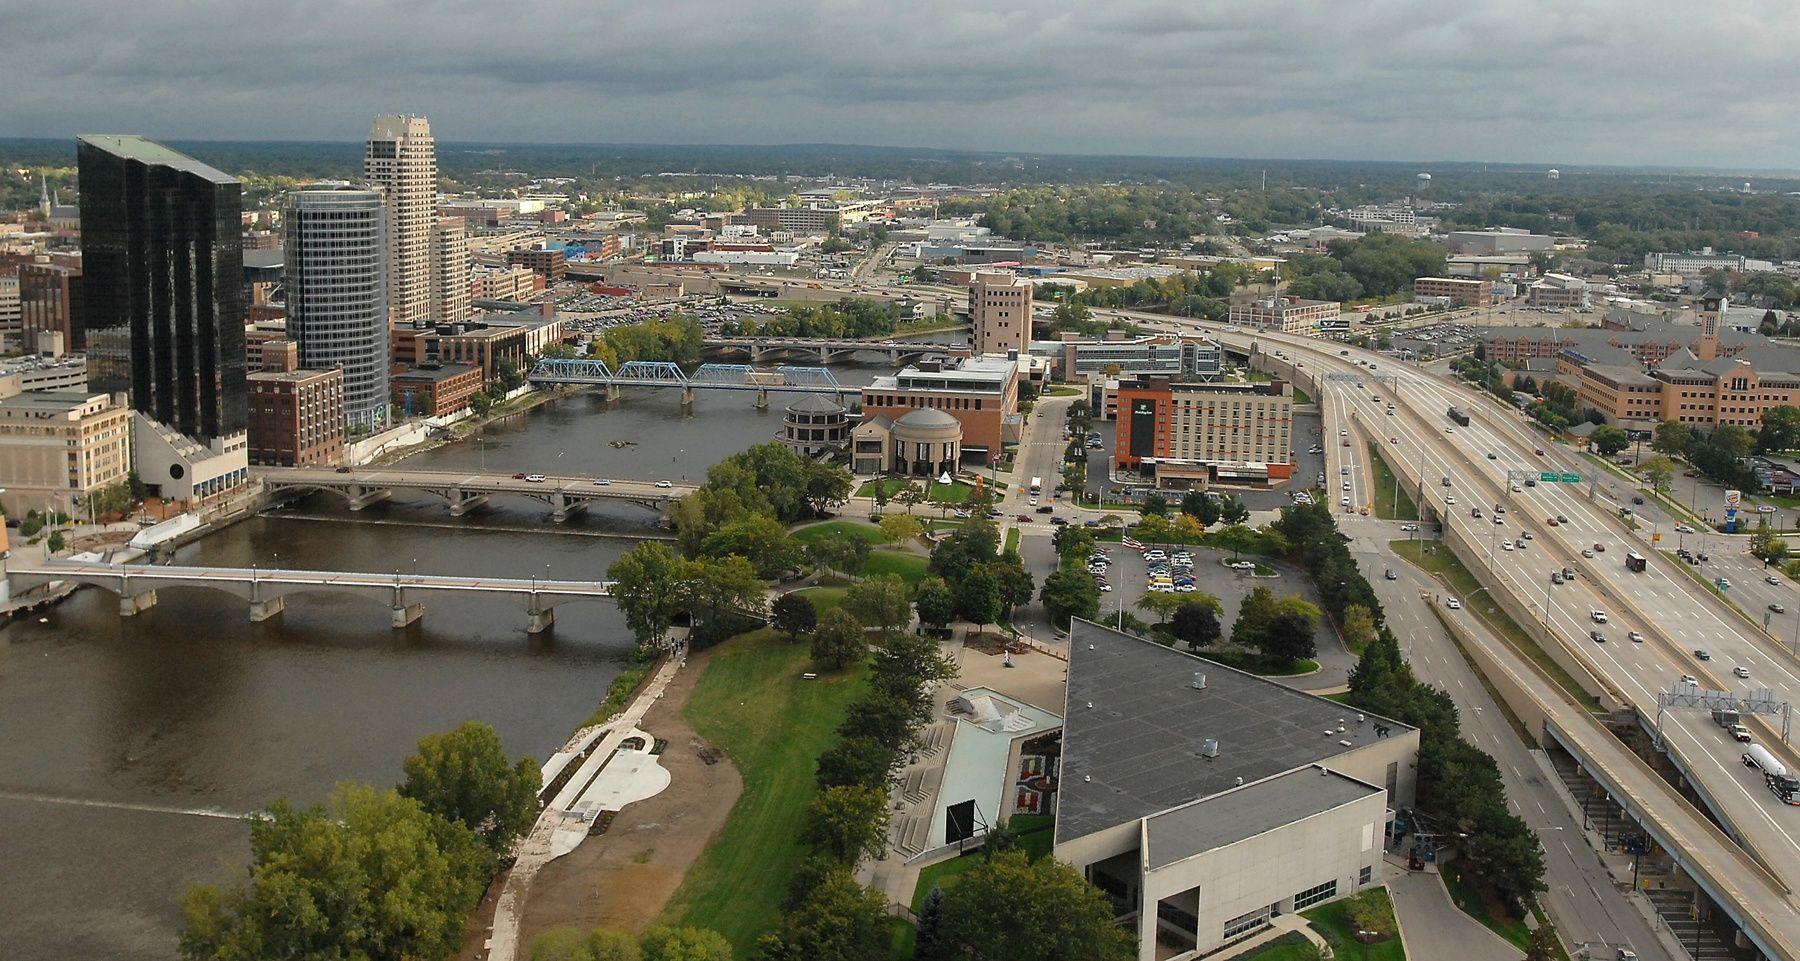 A Penthouse View